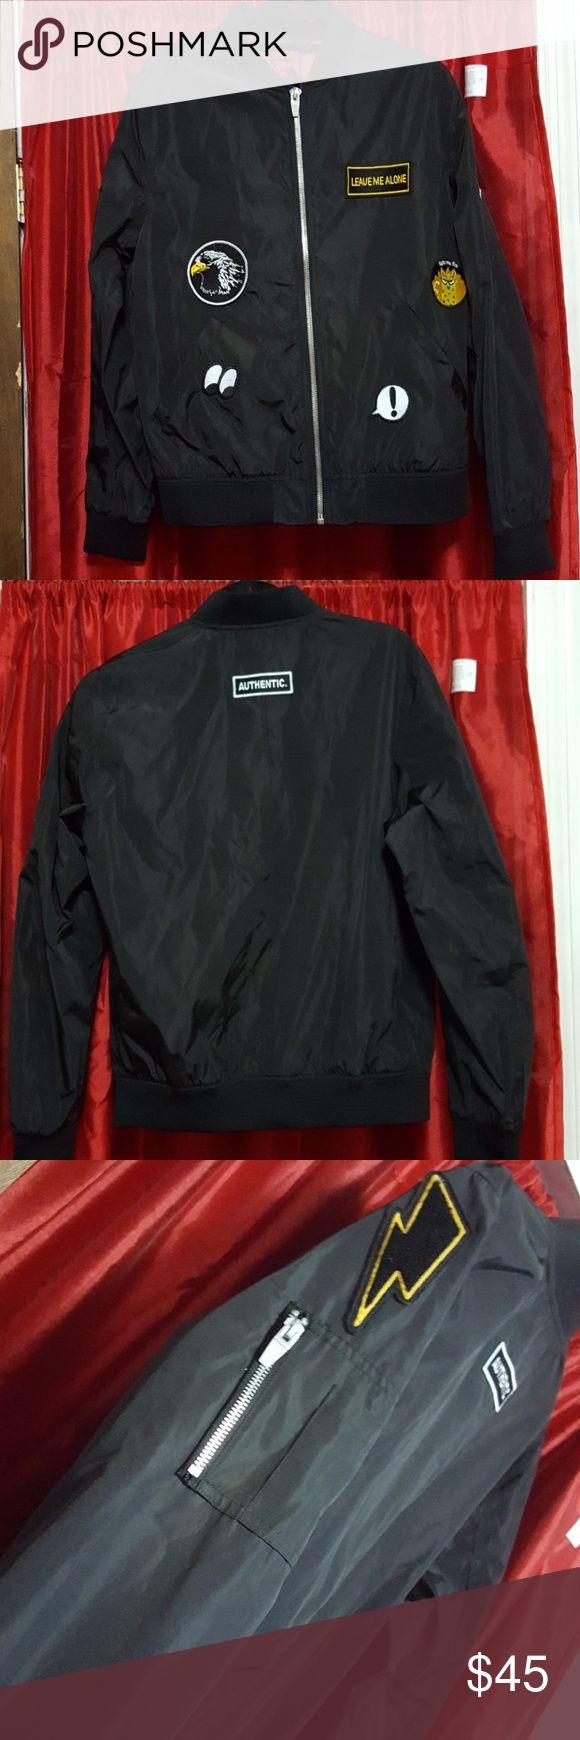 ZARA MAN men's bomber JACKET Black bomber JACKET featuring patches throughout Zara Man Jackets & Coats Bomber & Varsity